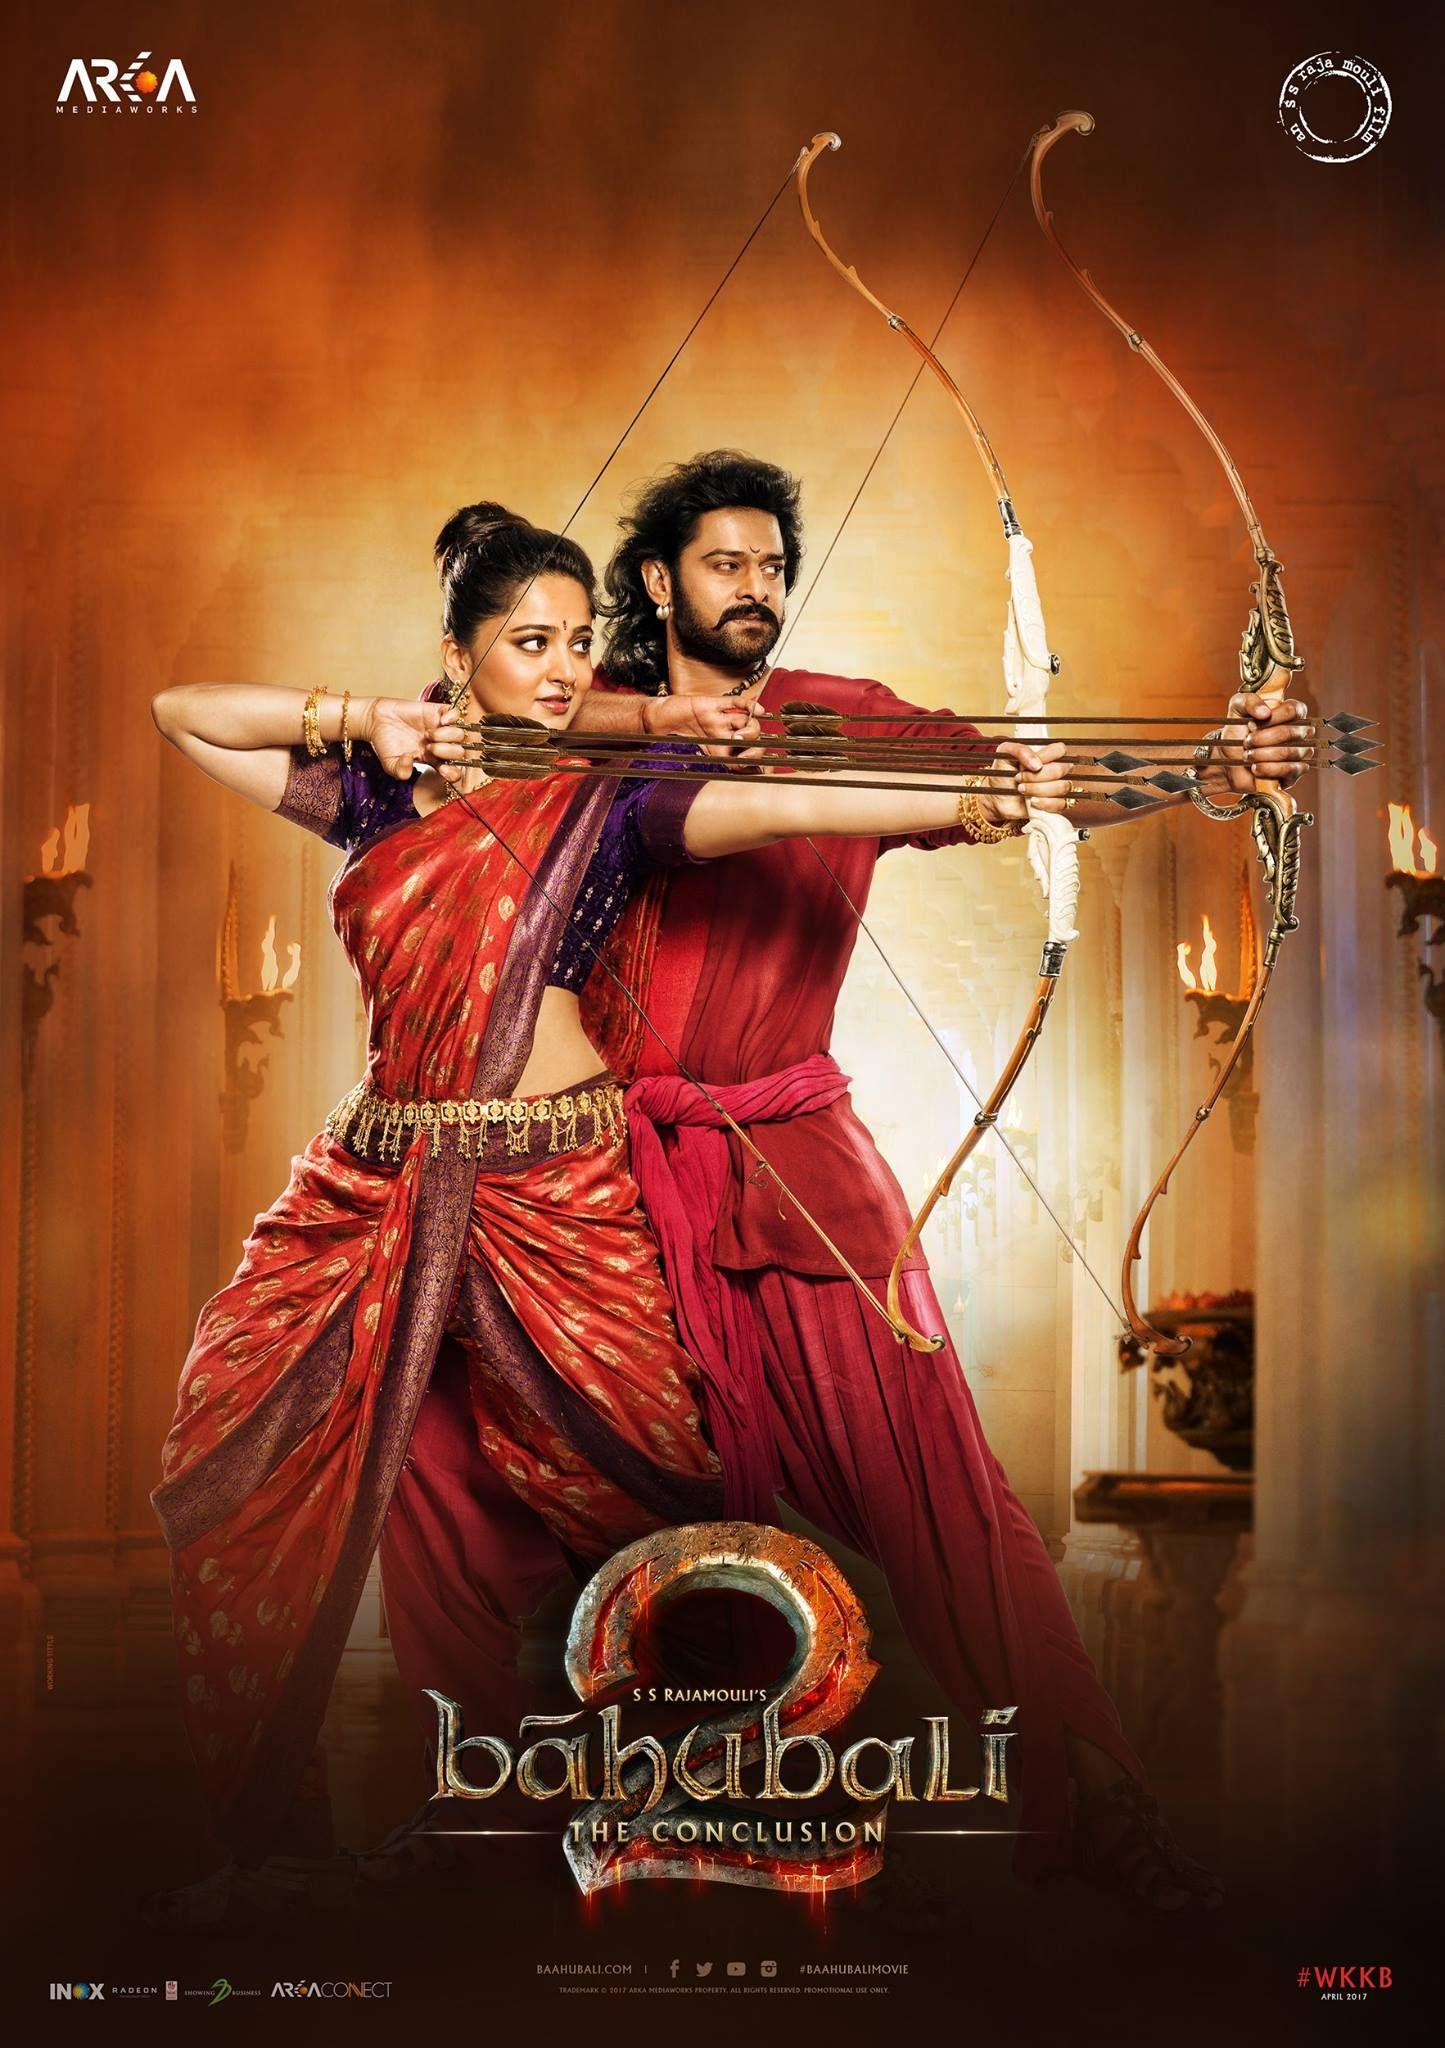 Bahubali 2 Official Poster Prabhas Anushka Shetty Rana Daggubati Tamannaah Directed By S S Rajamouli Bahubali Movie Bahubali 2 Full Movie Full Movies